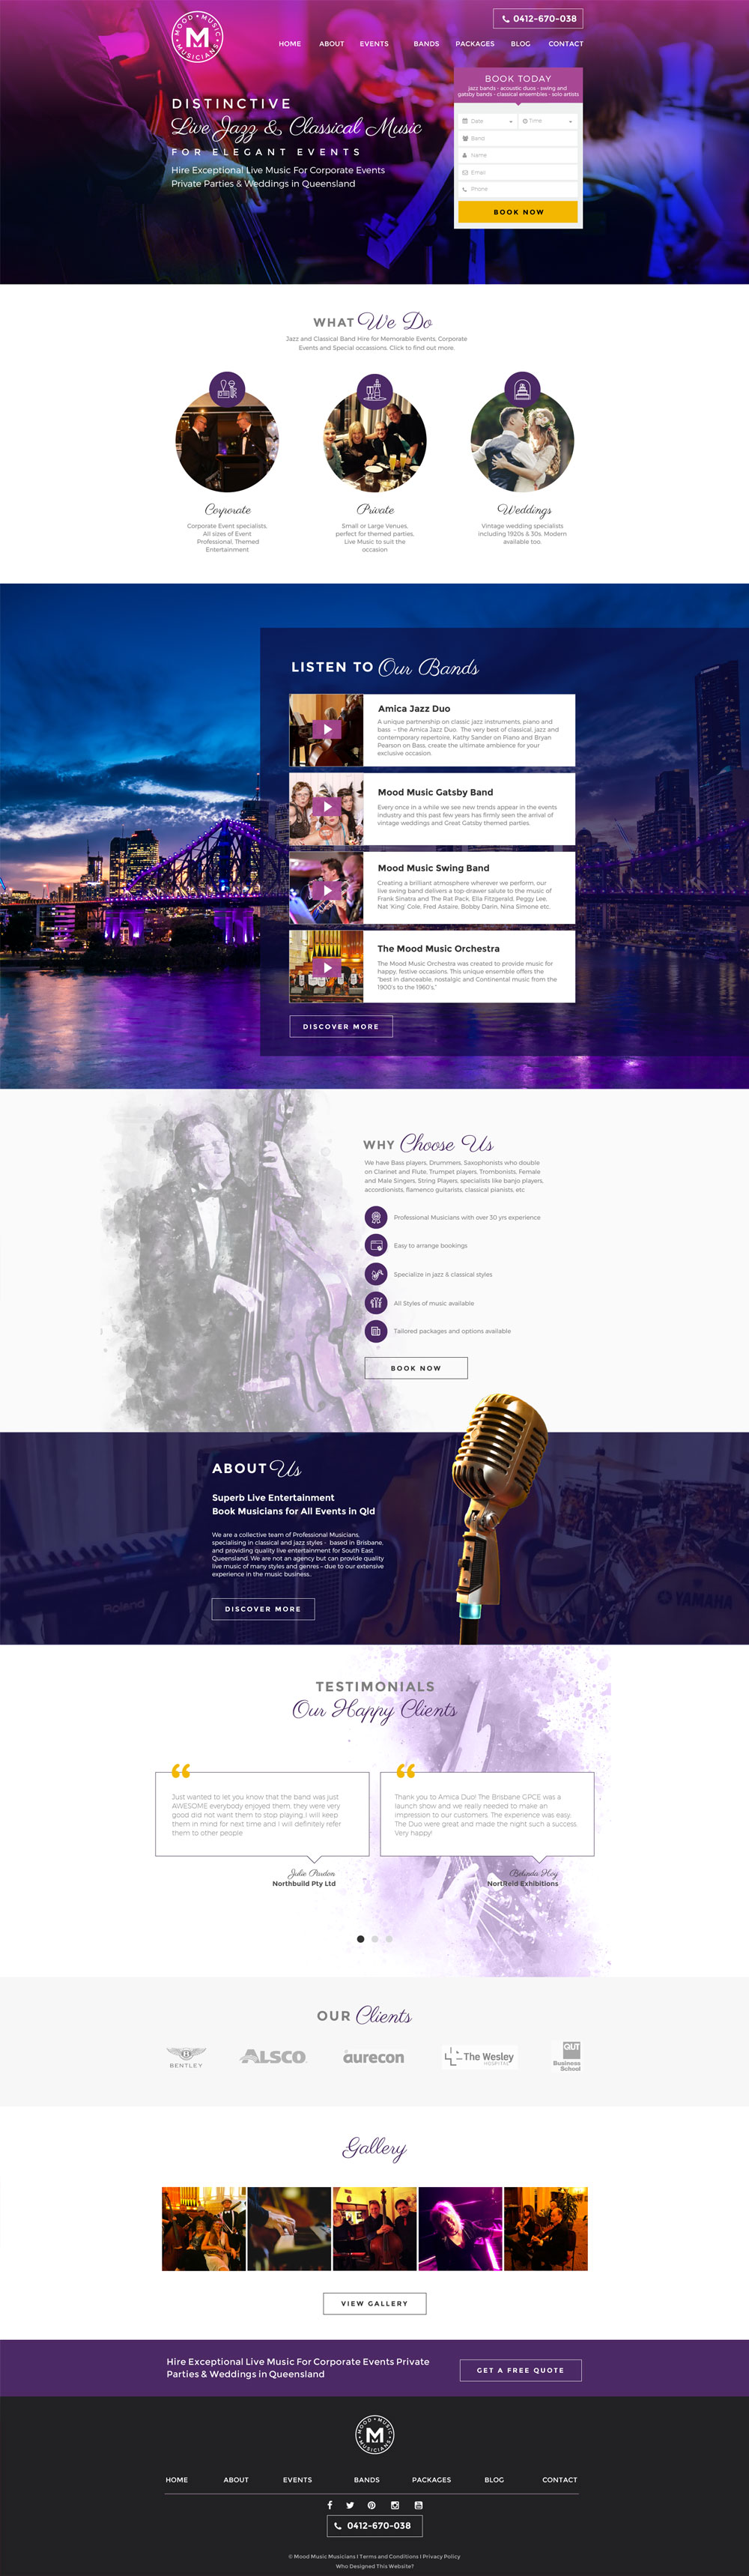 mood-music-web-design